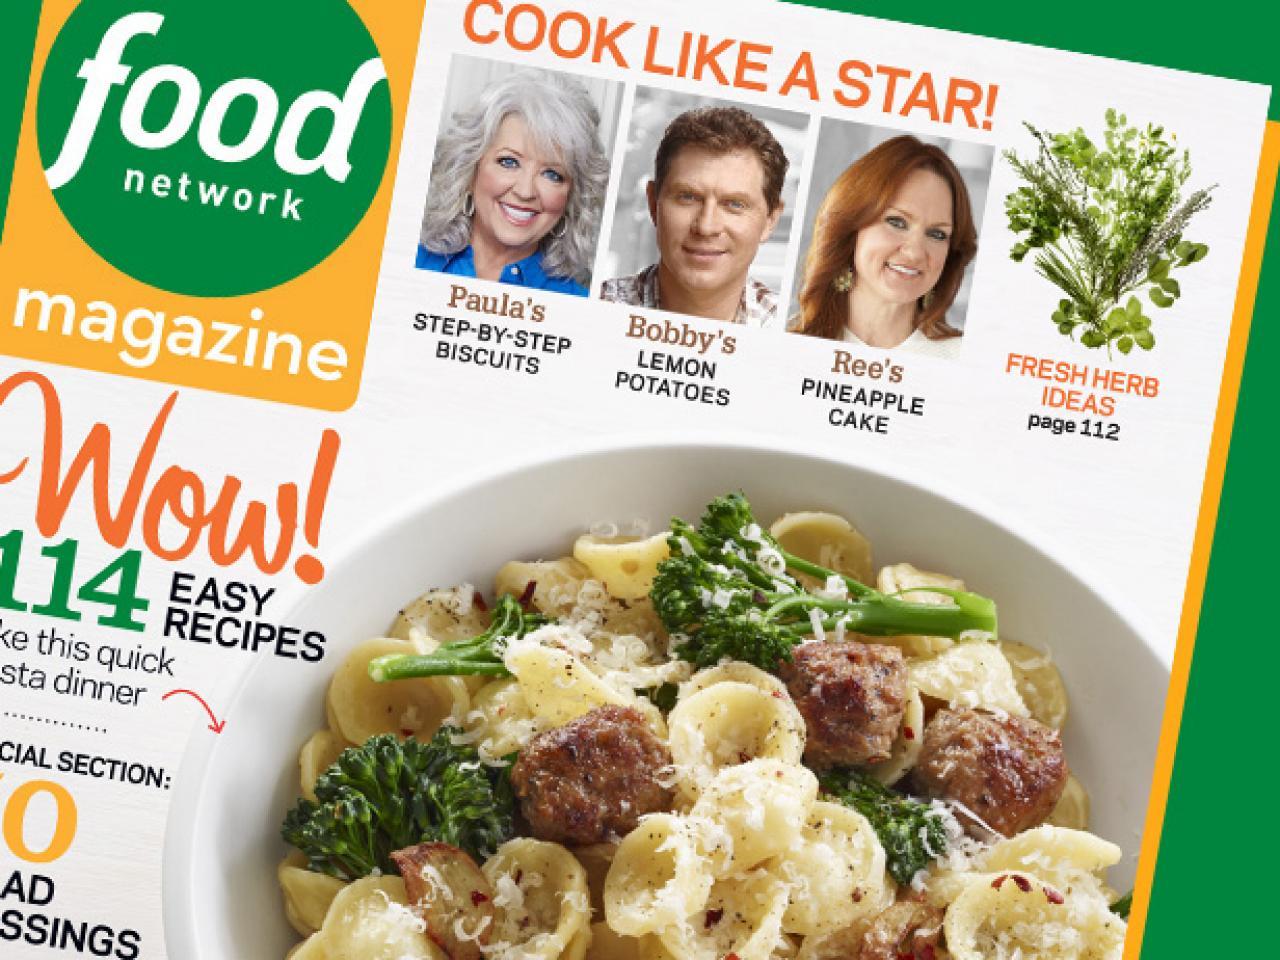 Food network magazine april 2013 recipe index recipes and cooking food network magazine april 2013 recipe index forumfinder Images